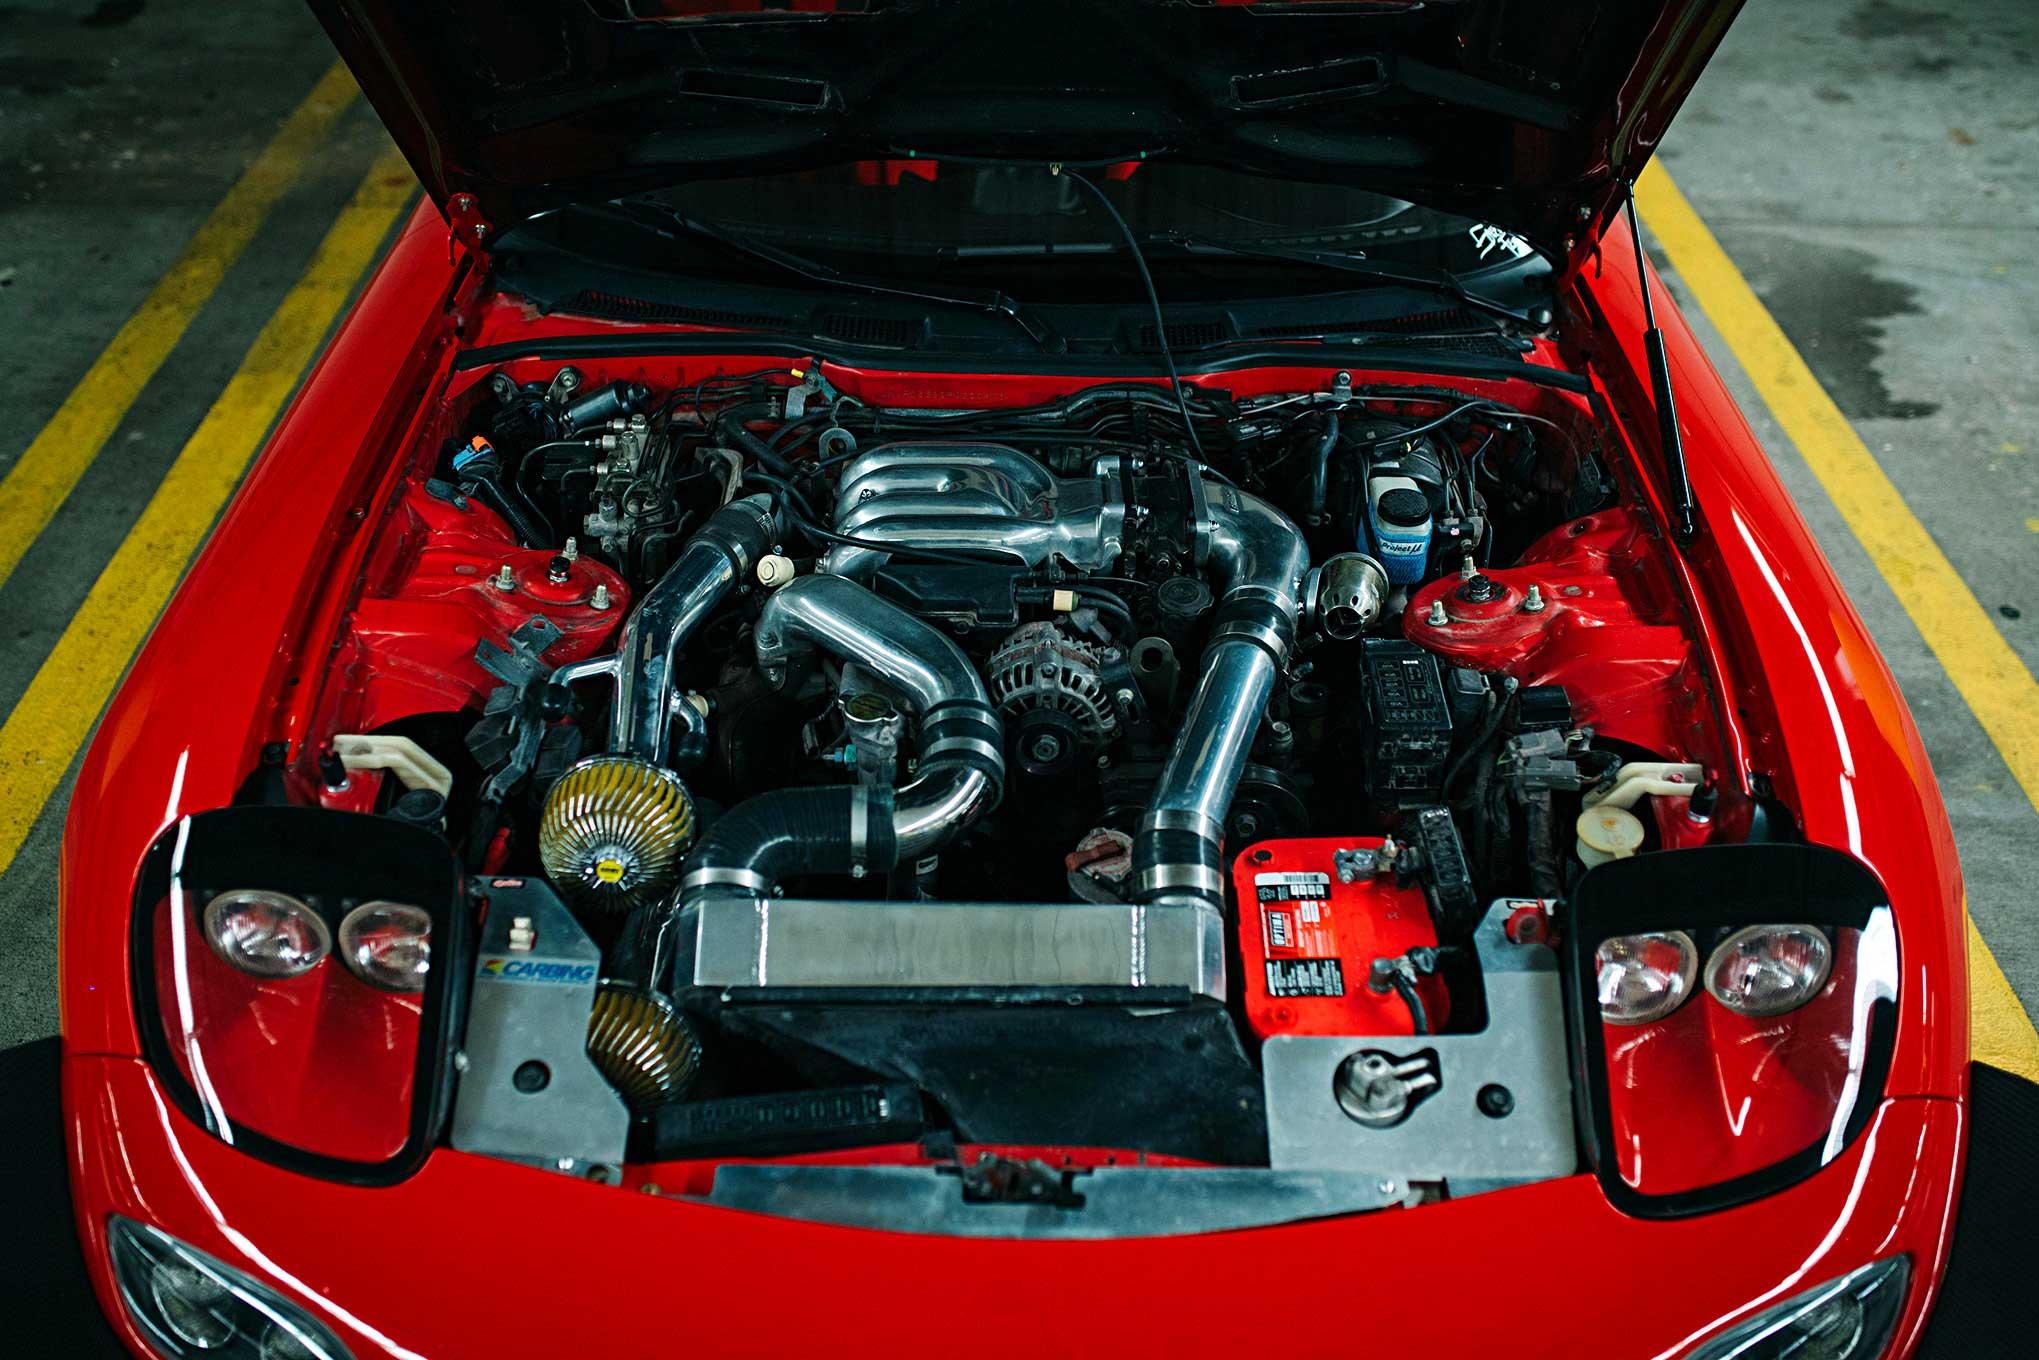 1993 mazda rx7 13b rew engine [ 2039 x 1360 Pixel ]